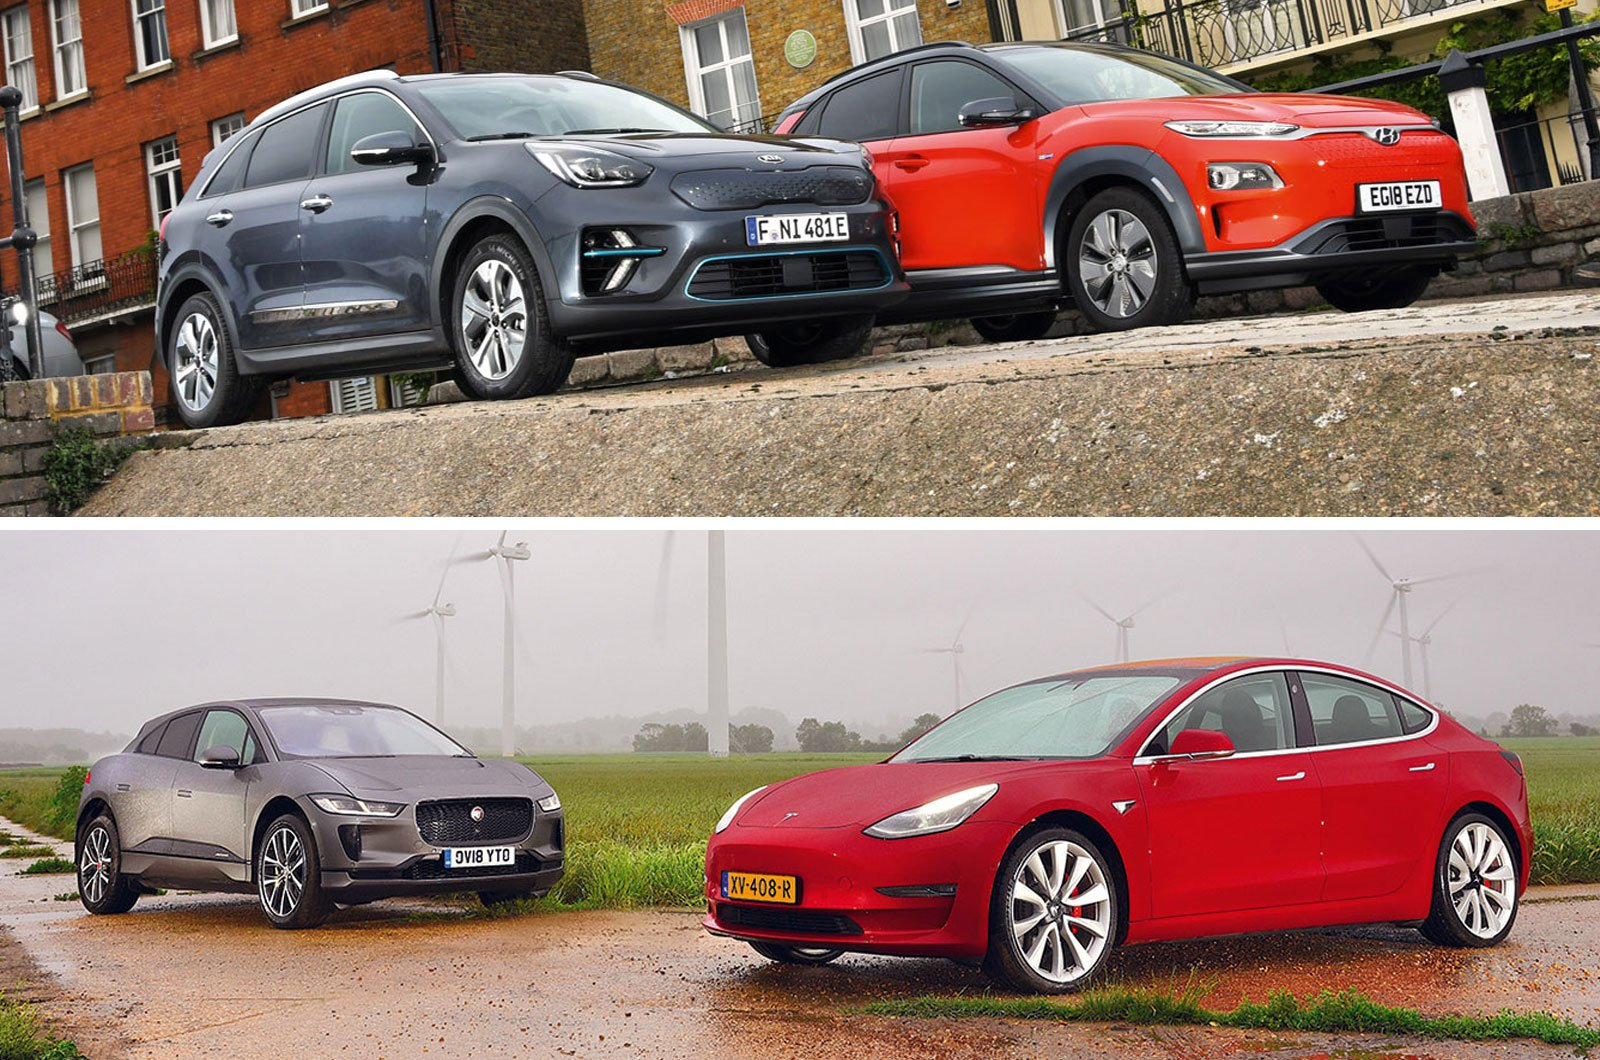 Kia e-Niro, Hyundai Kona Electric, Jaguar I-Pace, Tesla Model 3